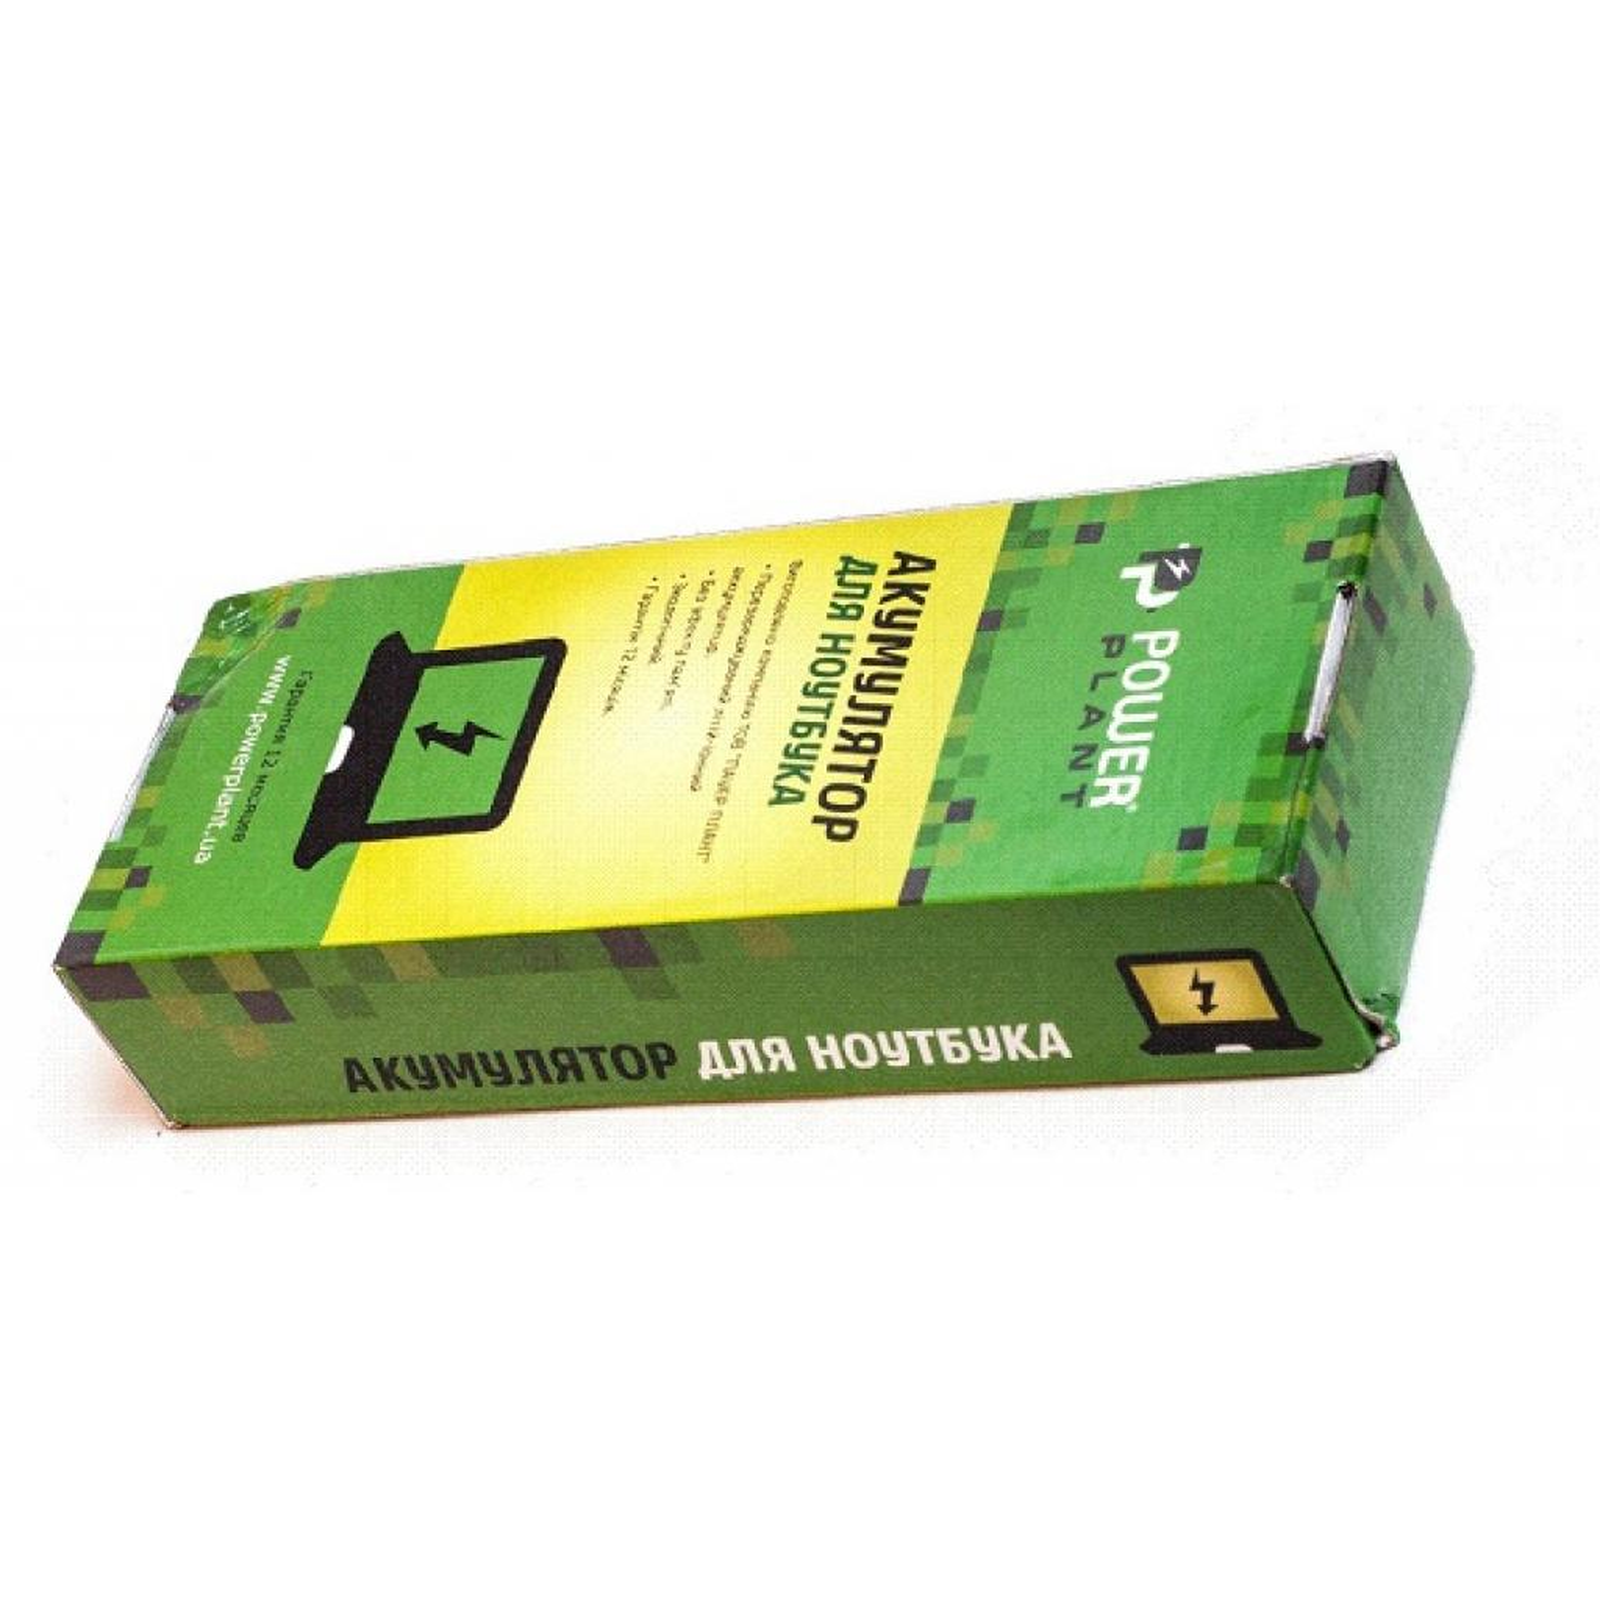 Аккумулятор для ноутбука HP Business 6431S (HSTNN-DB51, H65203S2P) 10.8V 5200mAh PowerPlant (NB00000129) изображение 3